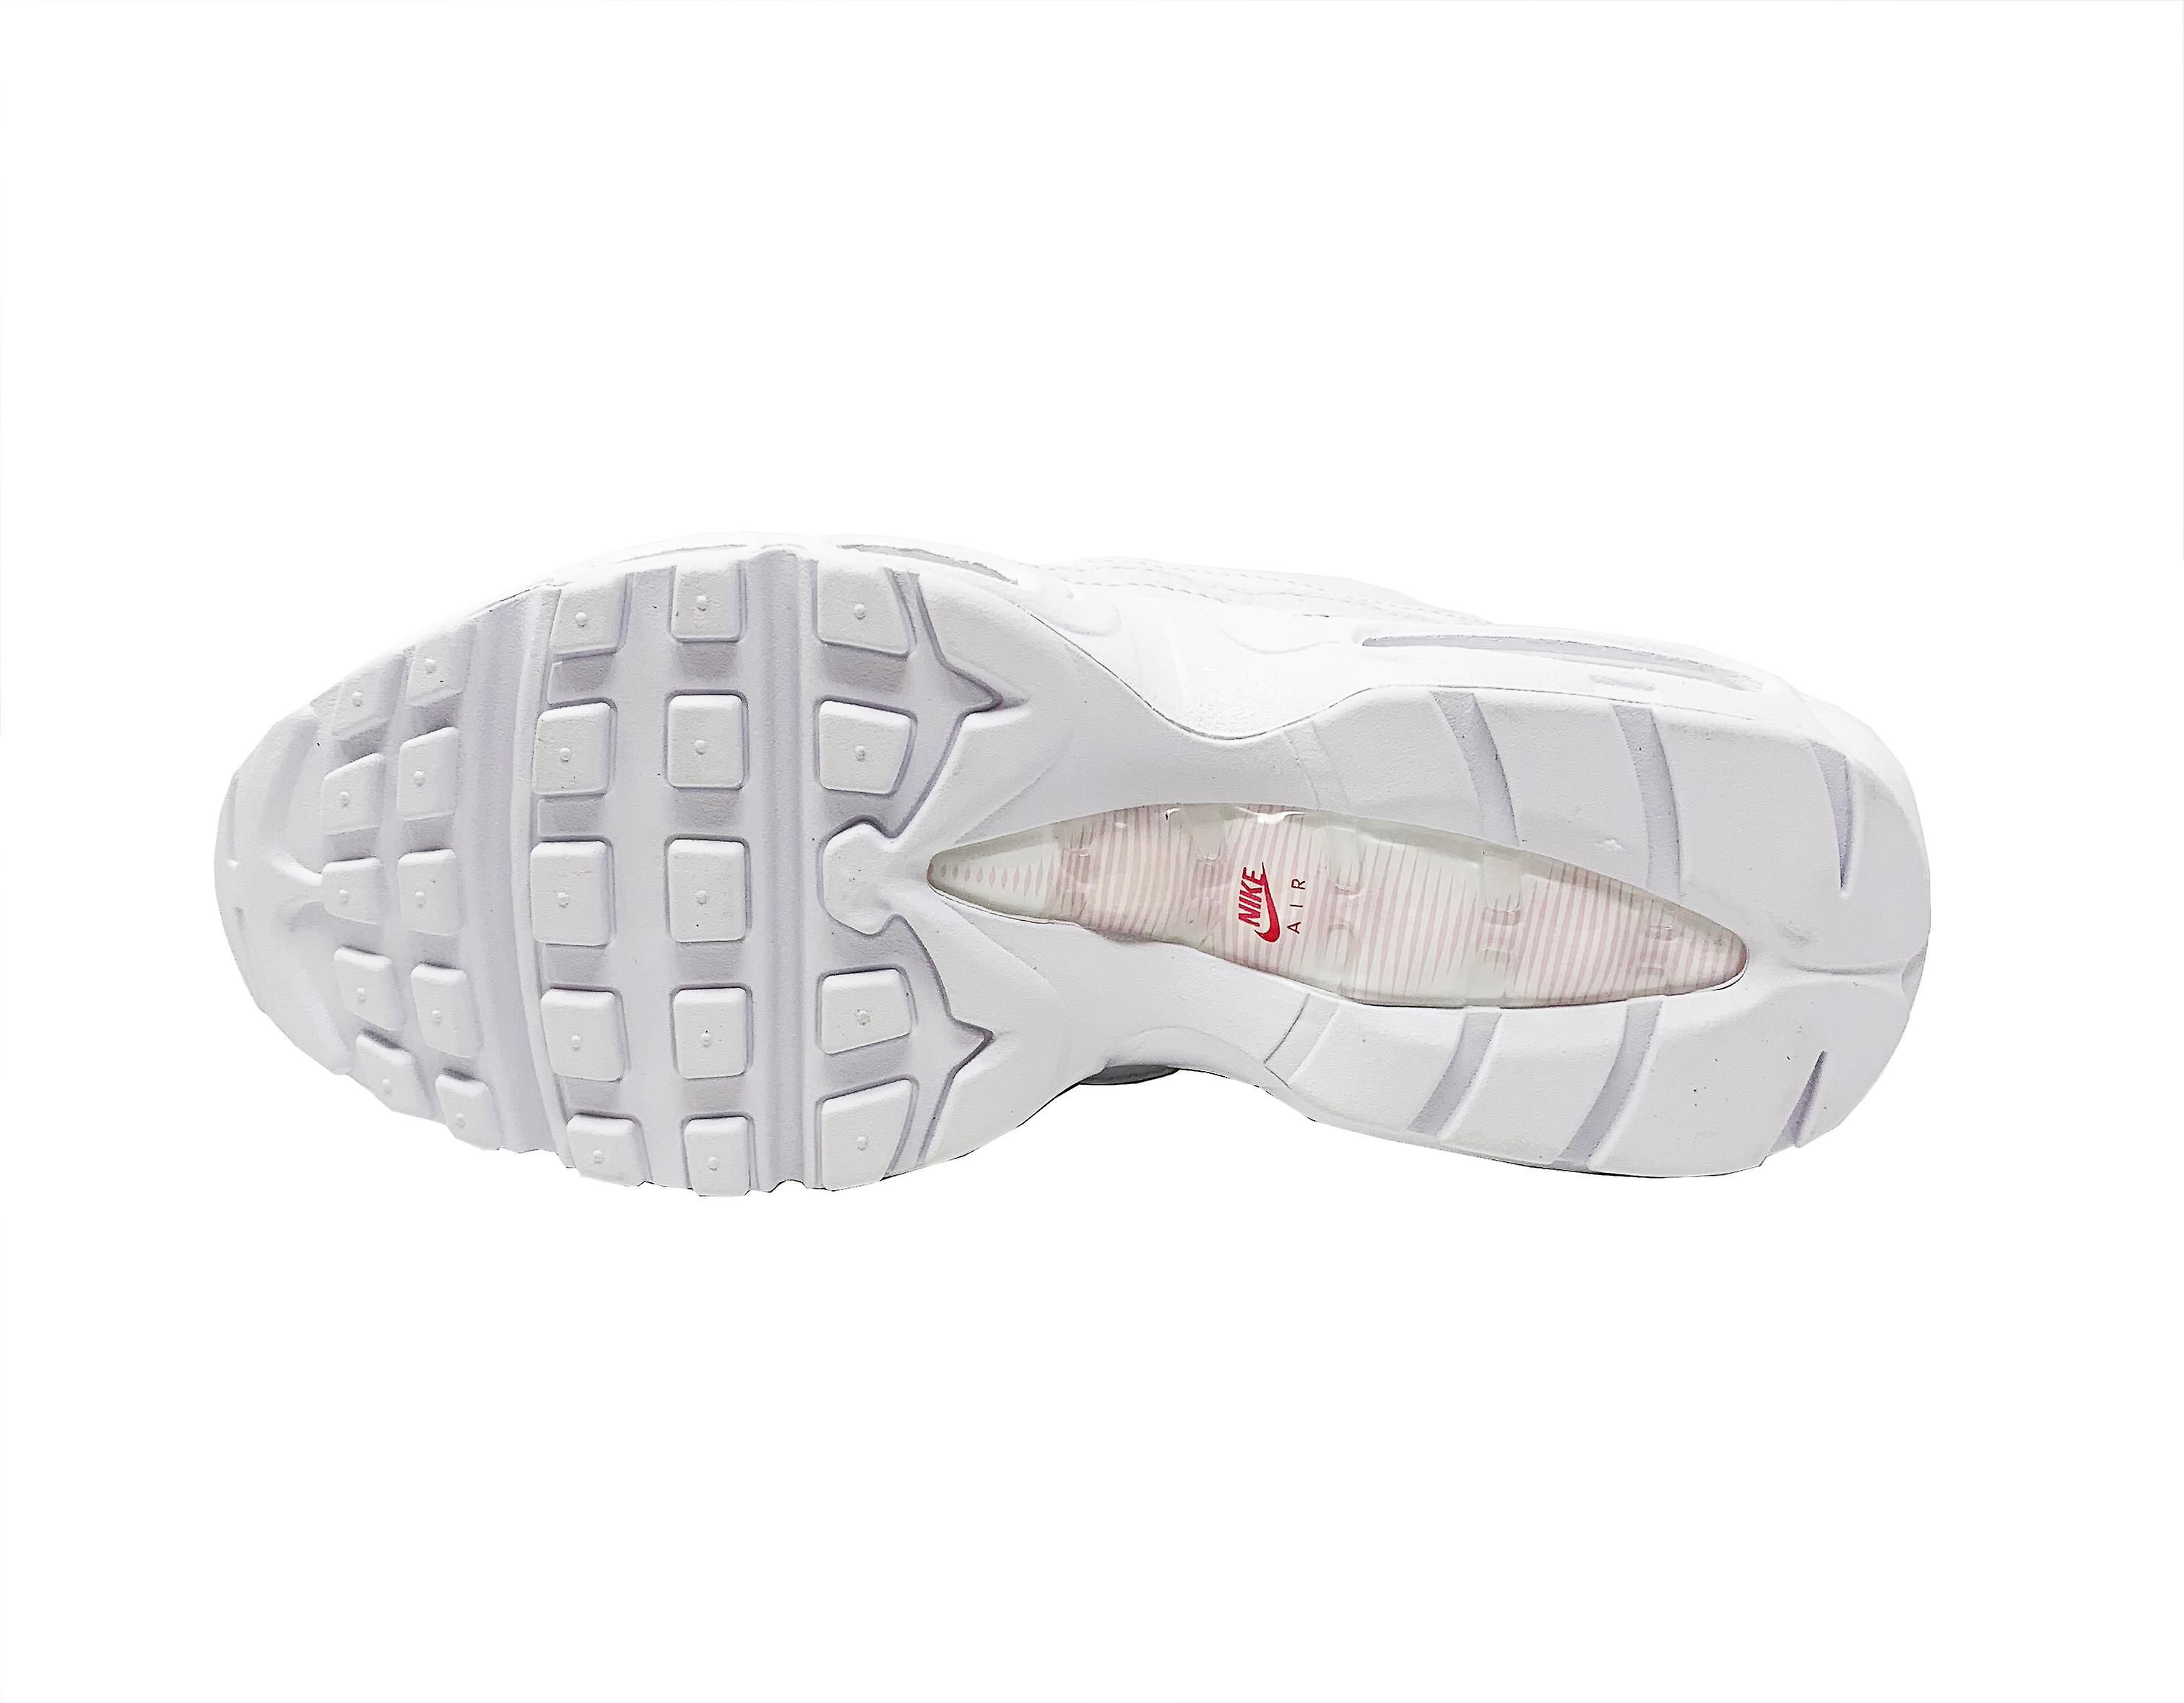 Nike zoom adidas women's shoes leisure sports 179a#)